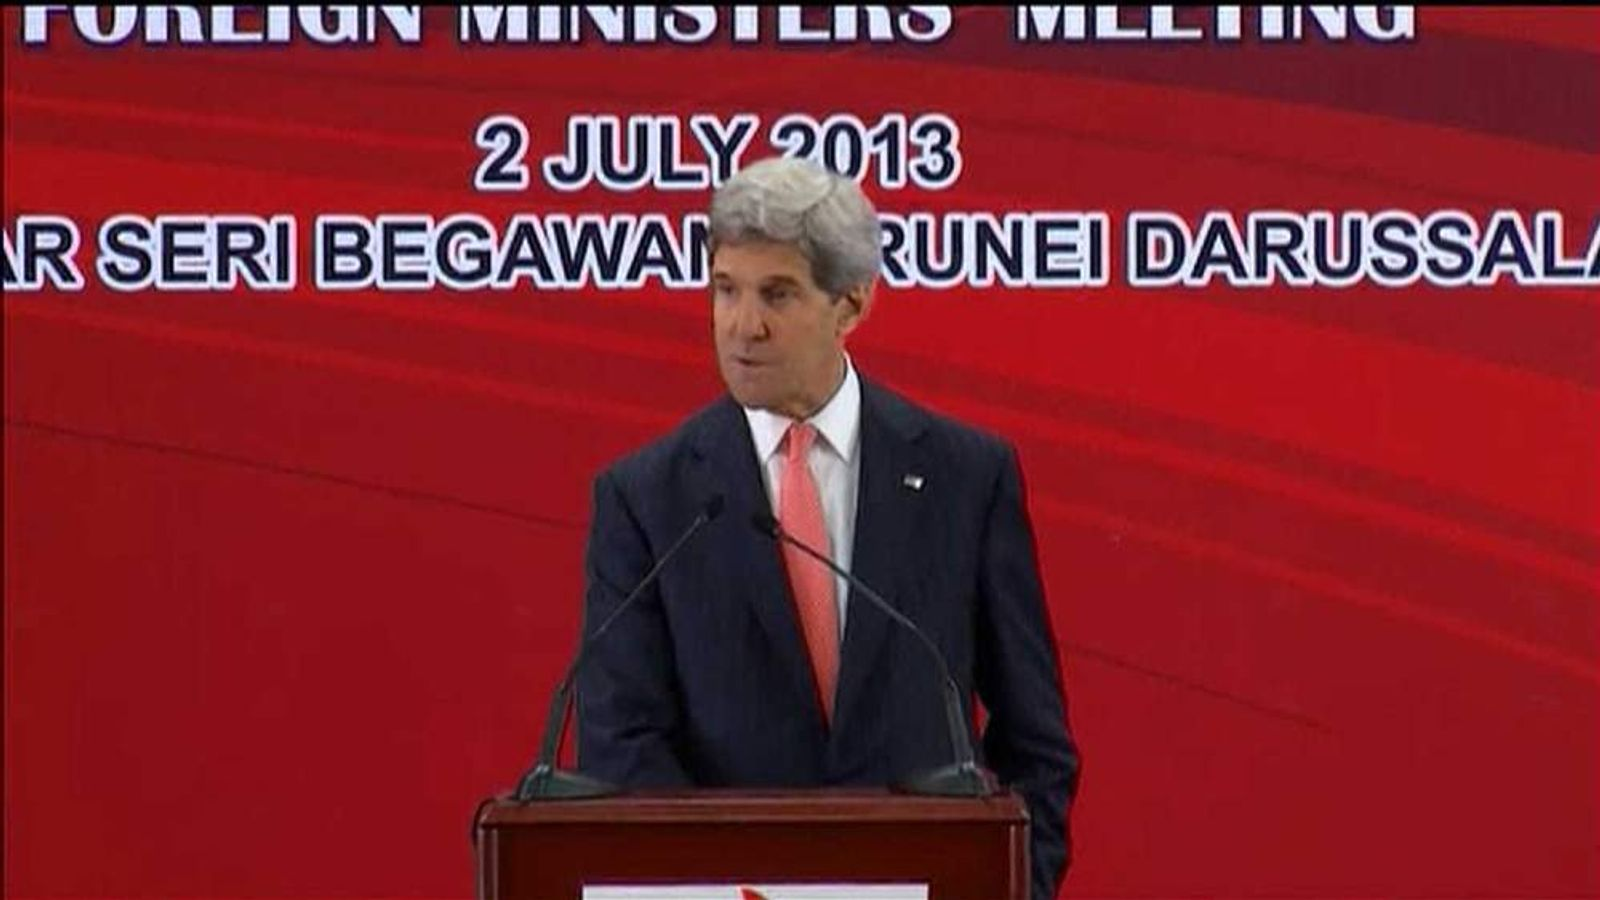 John Kerry responds to EU bugging